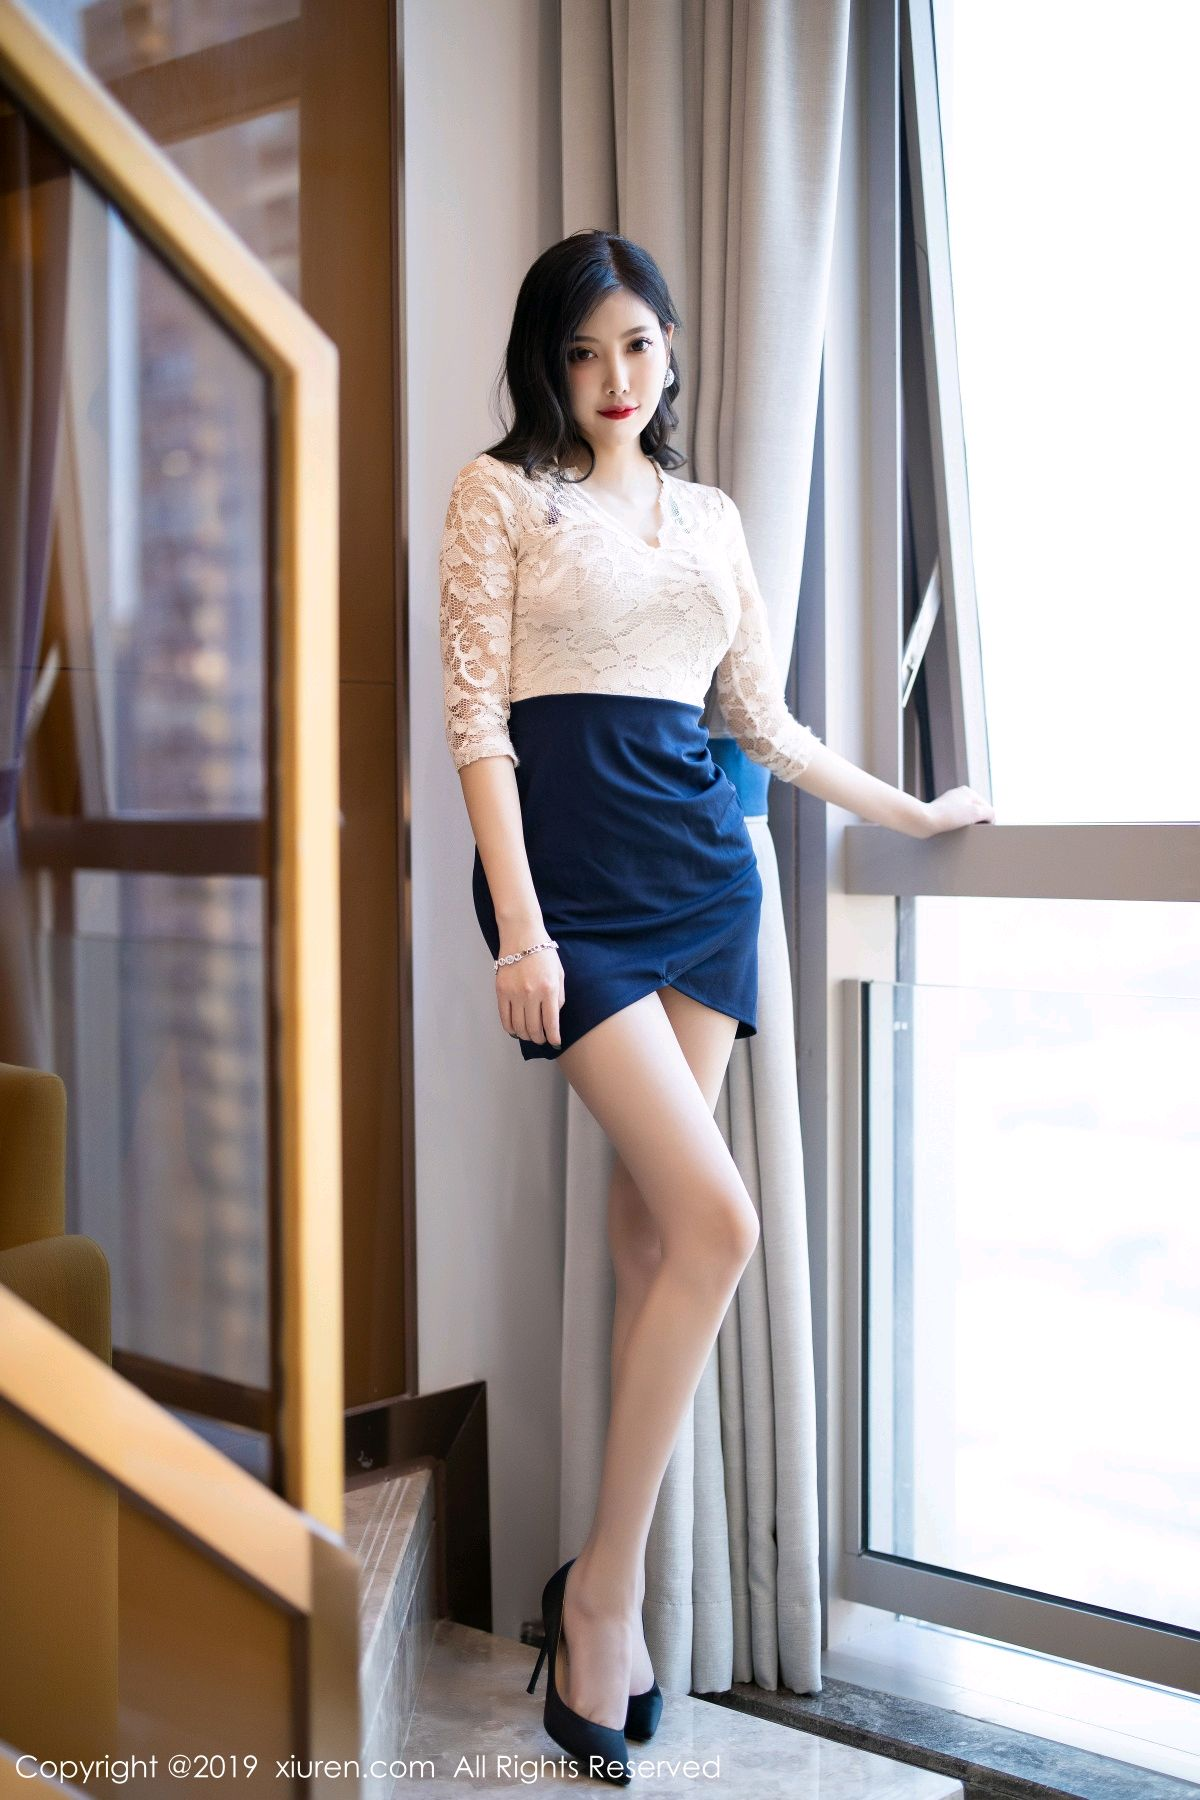 [XiuRen] Vol.1717 Yang Chen Chen 1P, Tall, Underwear, Xiuren, Yang Chen Chen